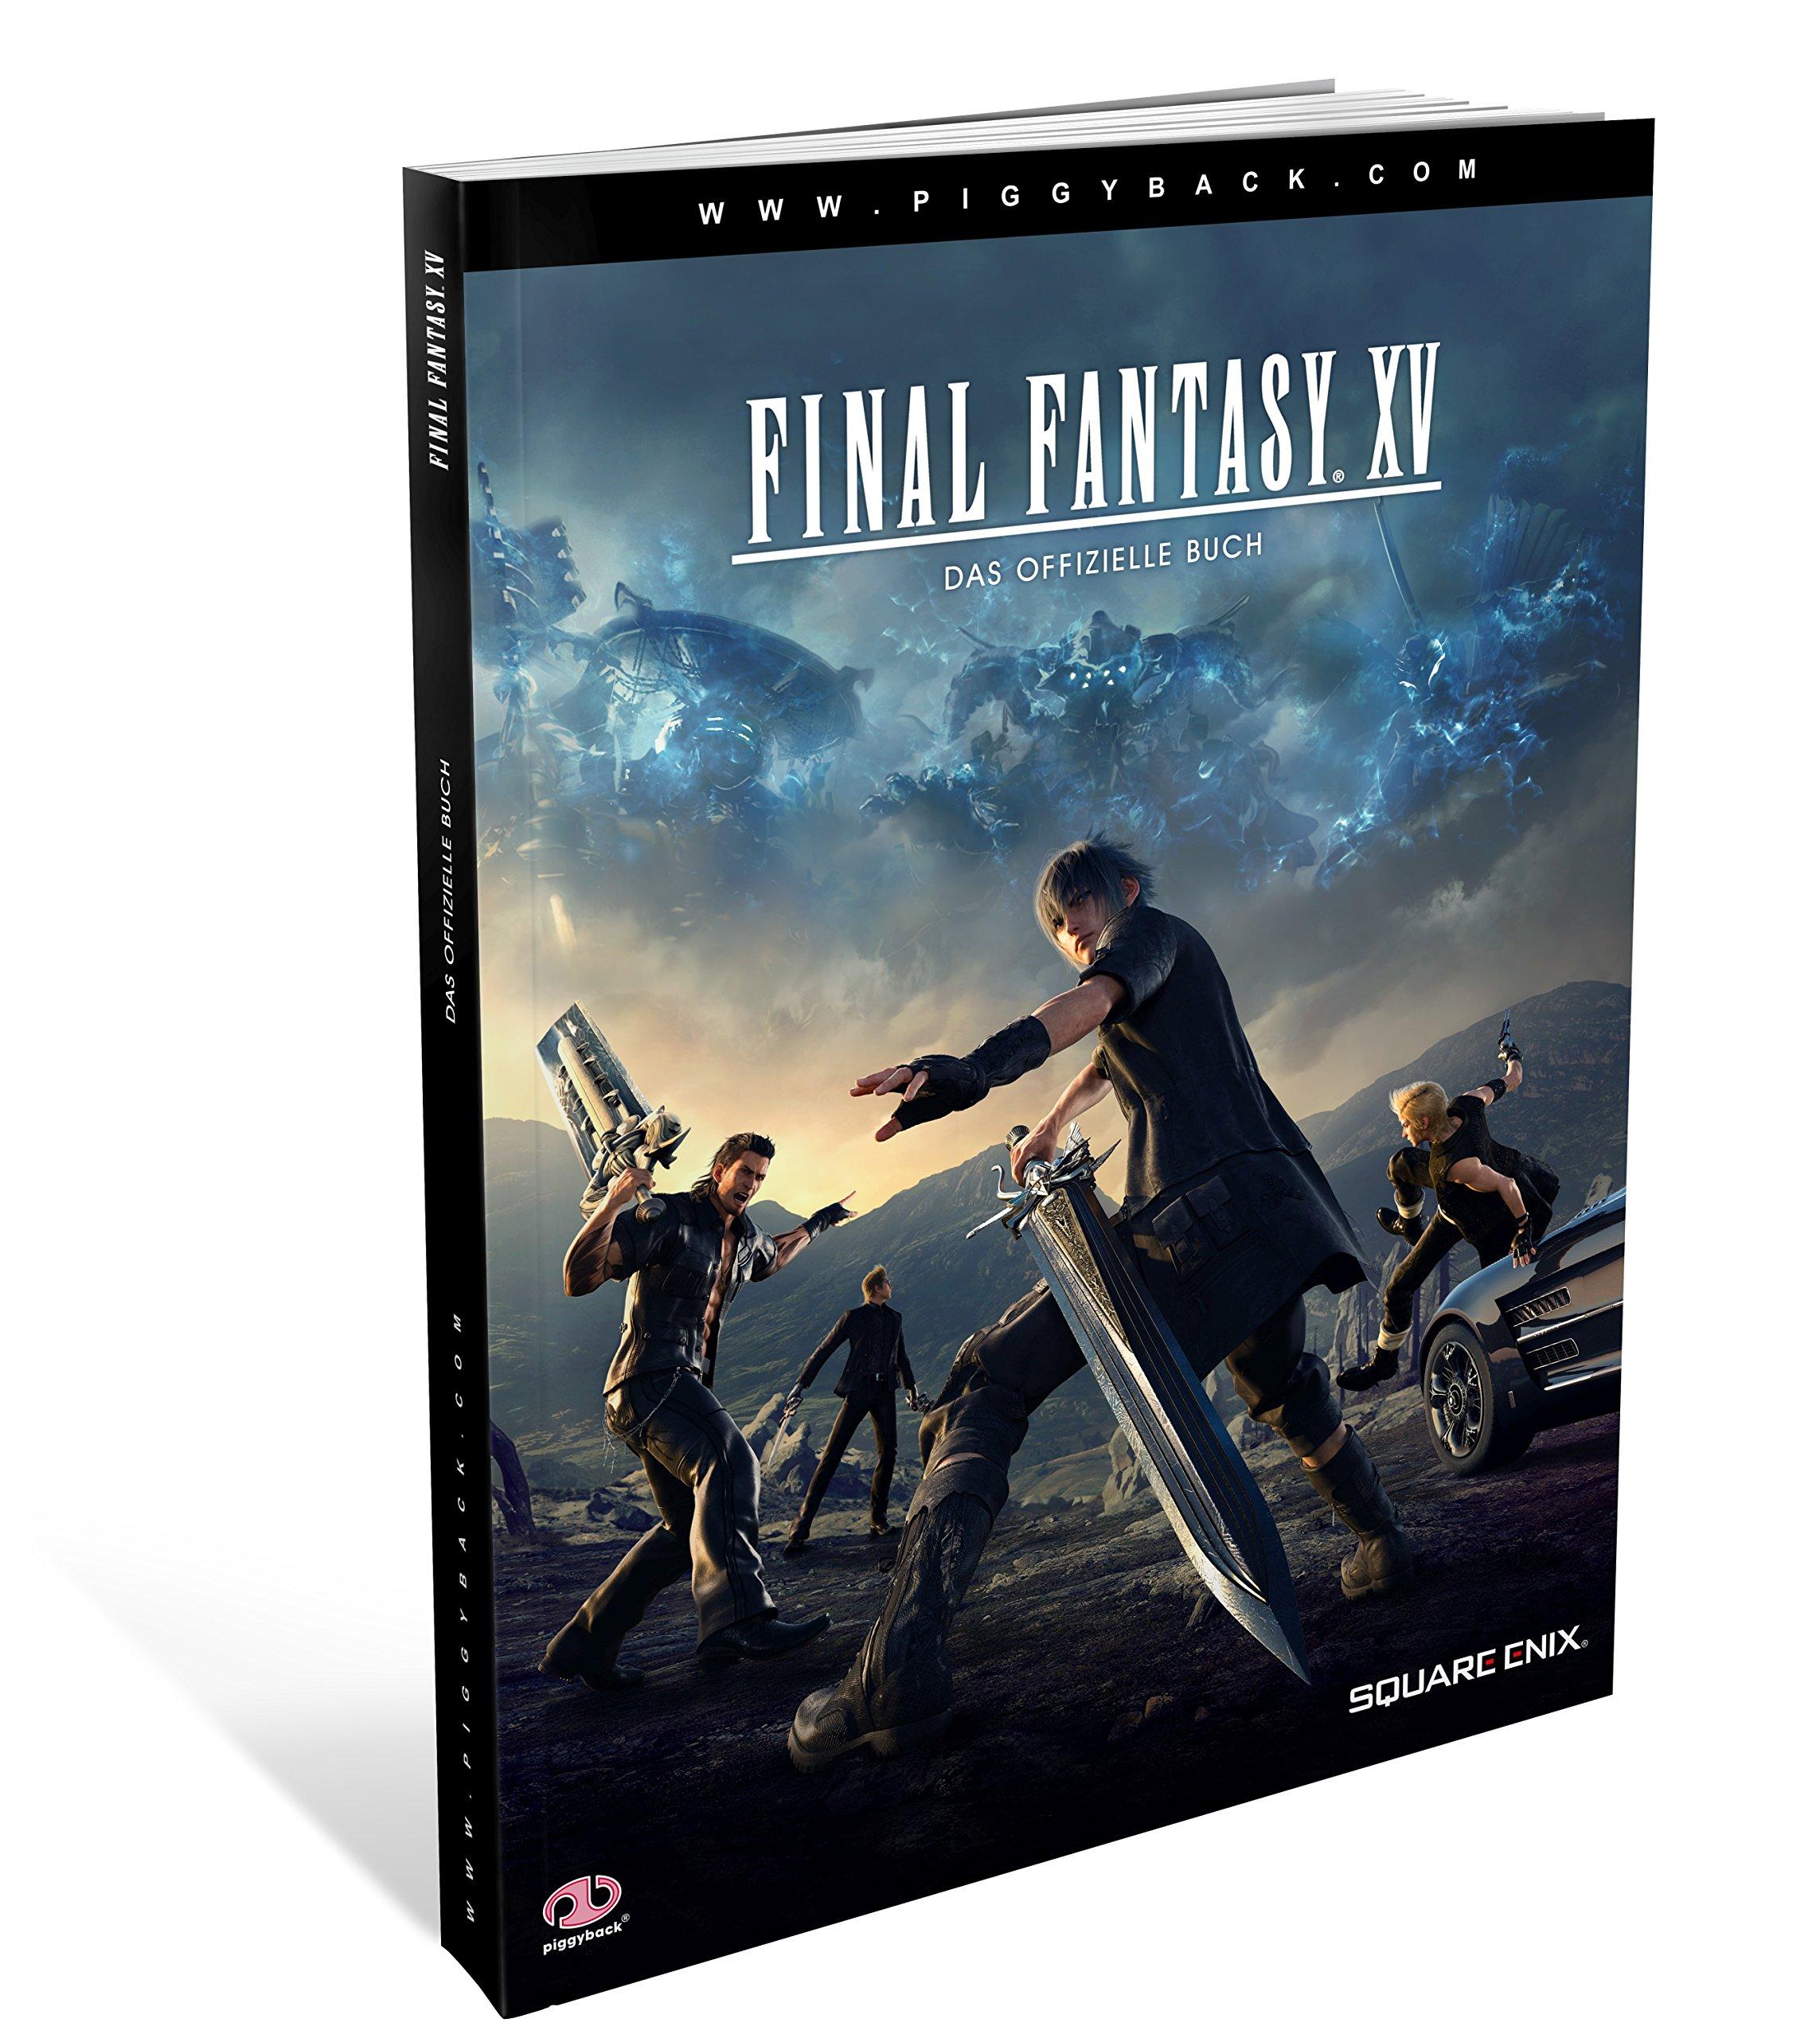 Final Fantasy XV: Das offizielle Buch – Standardedition